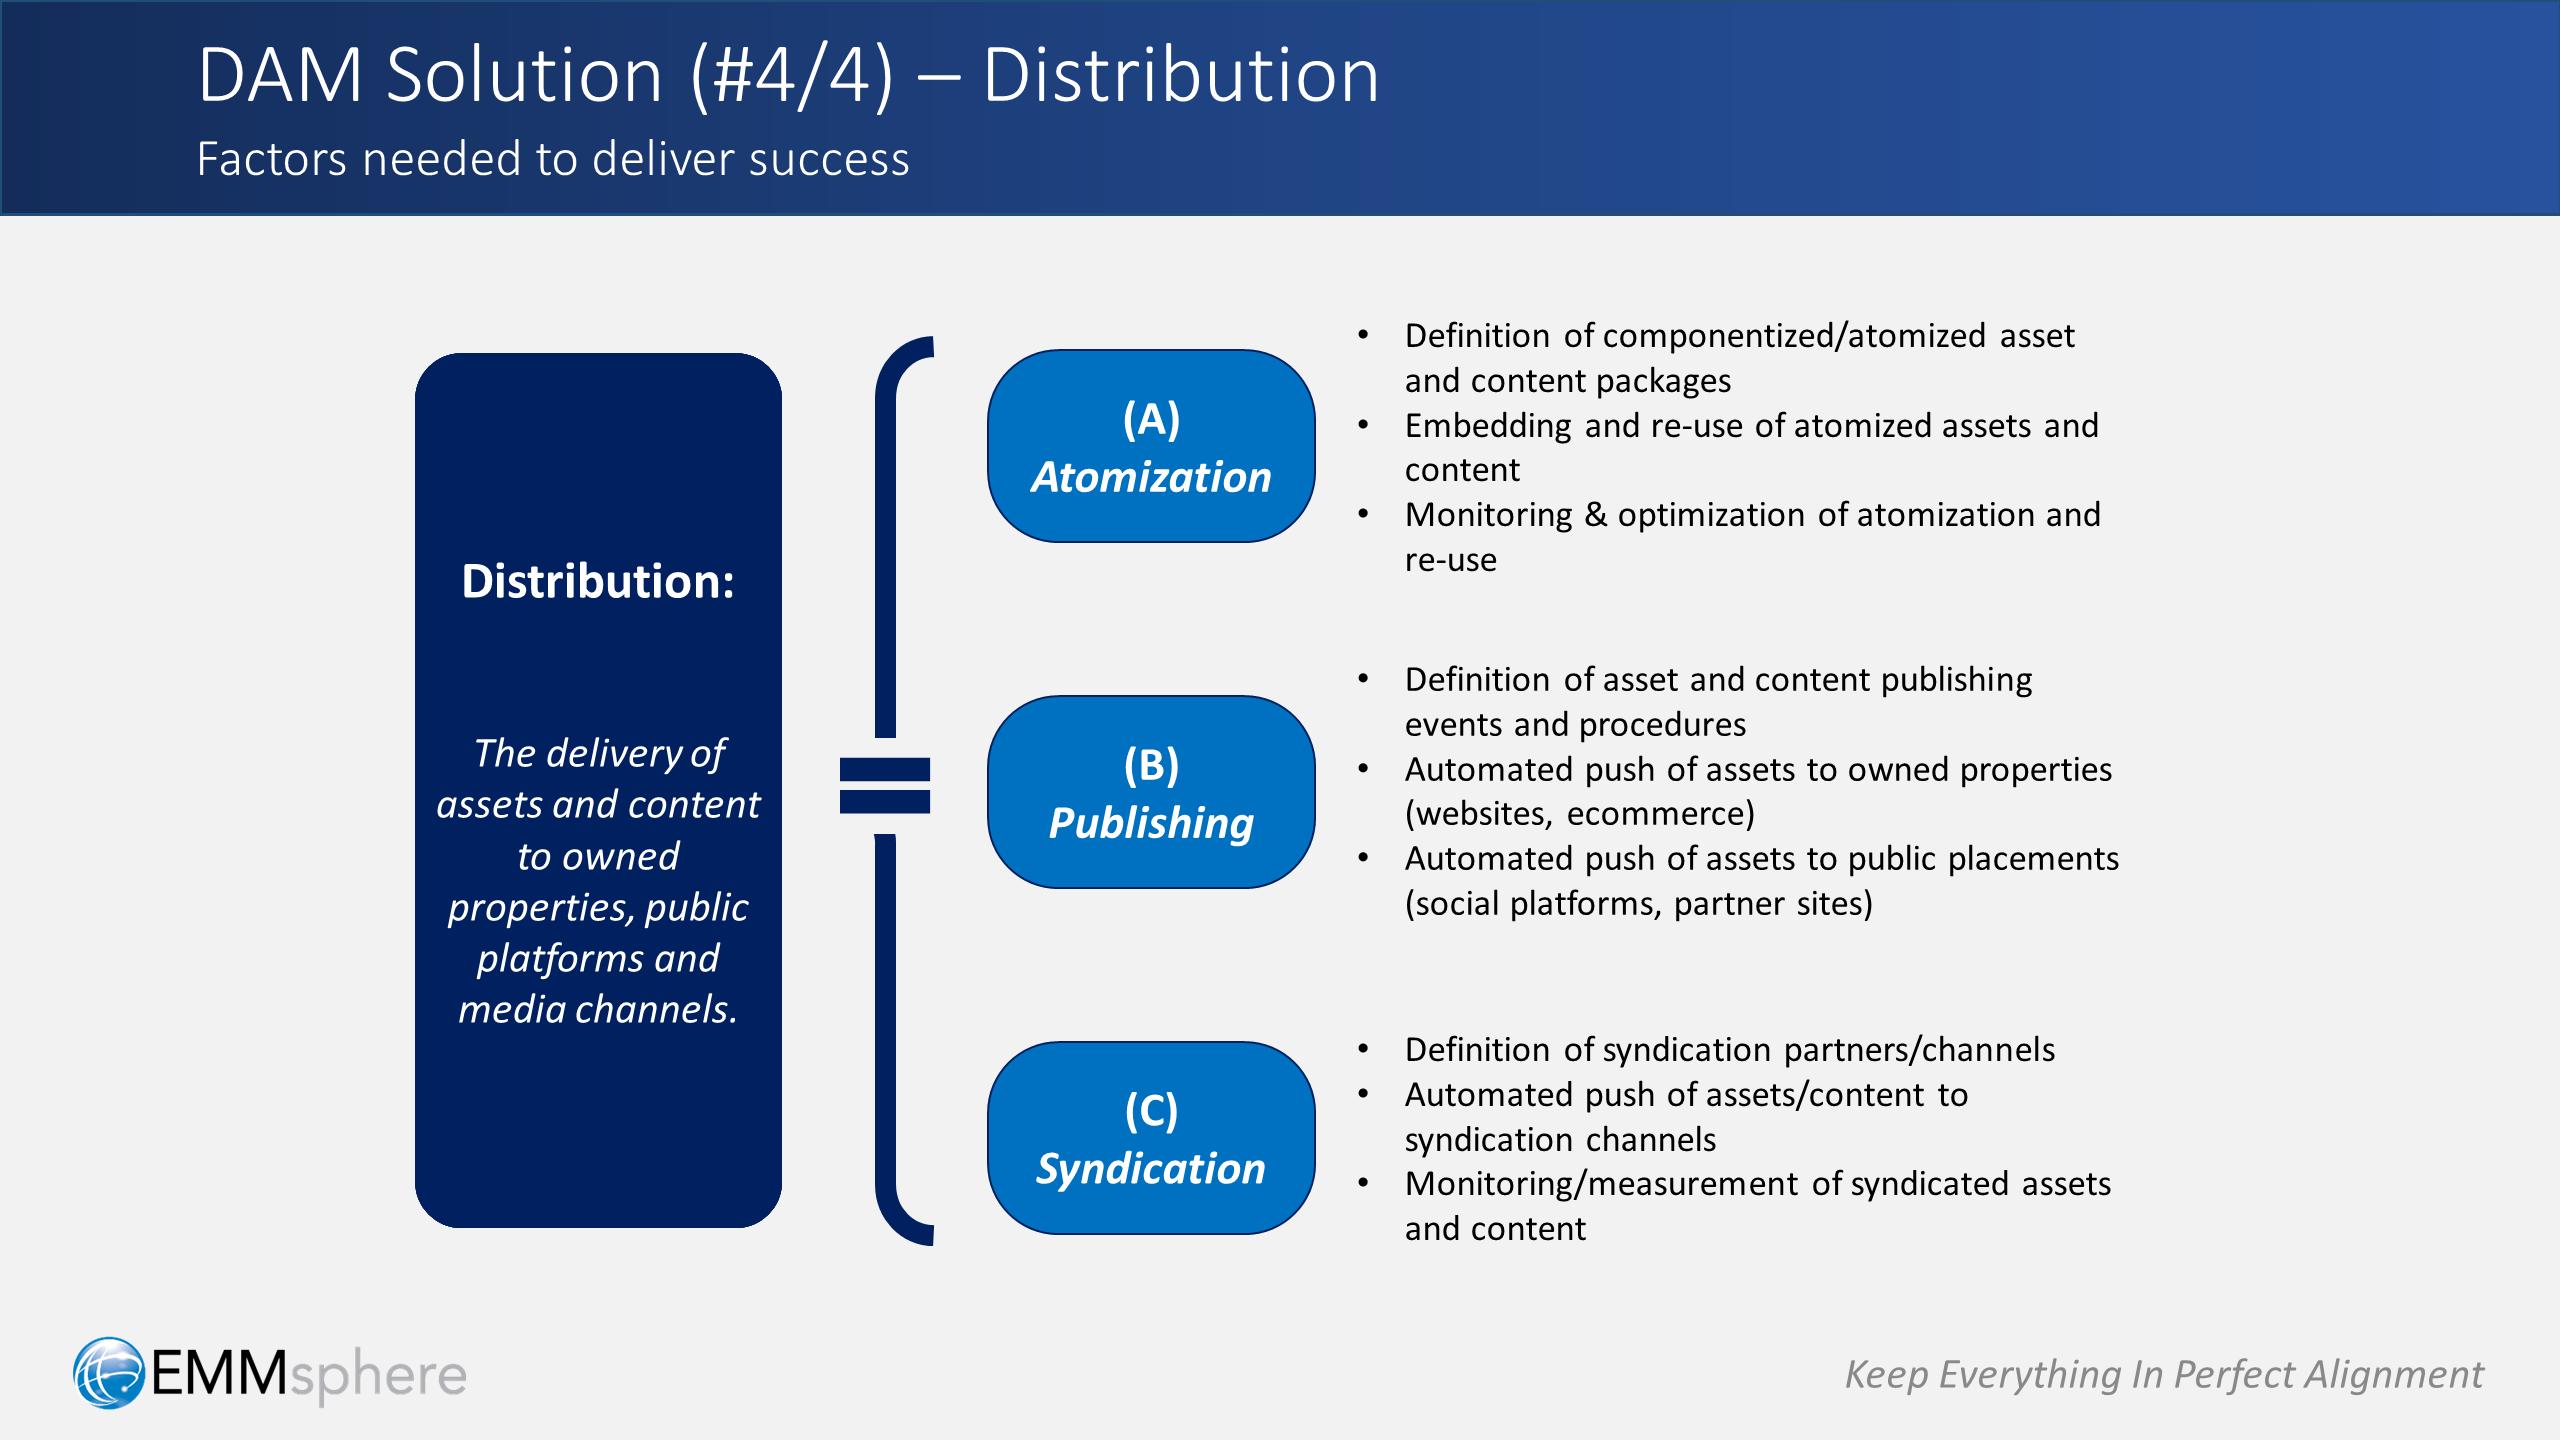 DAM Perspectives Part 5 - Distribution